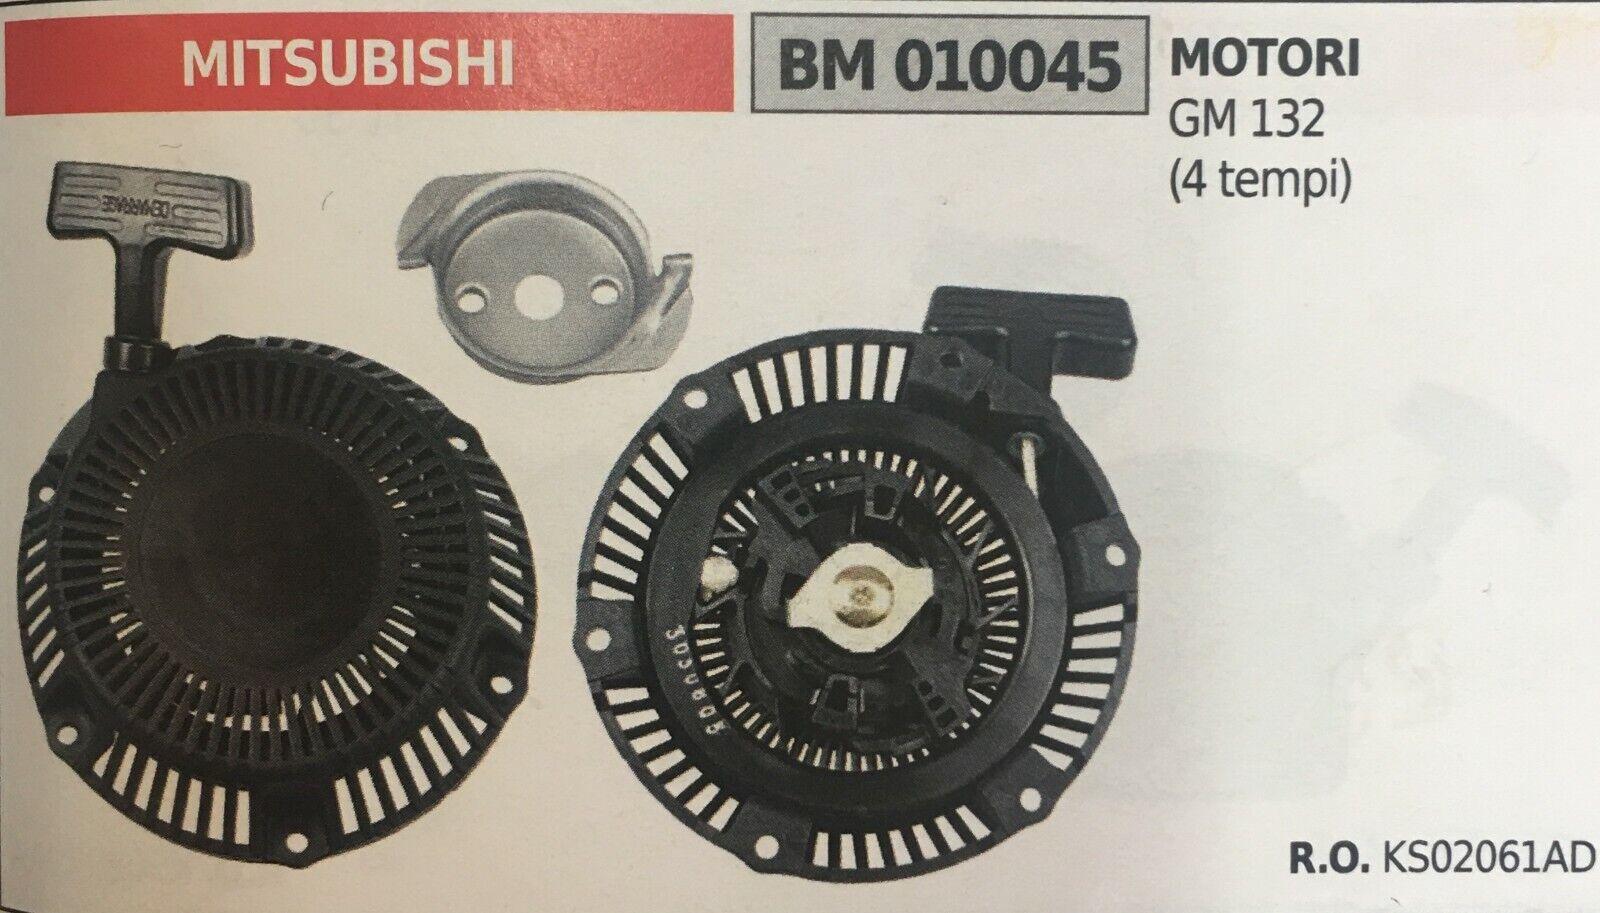 AVVIAMENTO COMPLETO BRUMAR MITSUBISHI BM010045